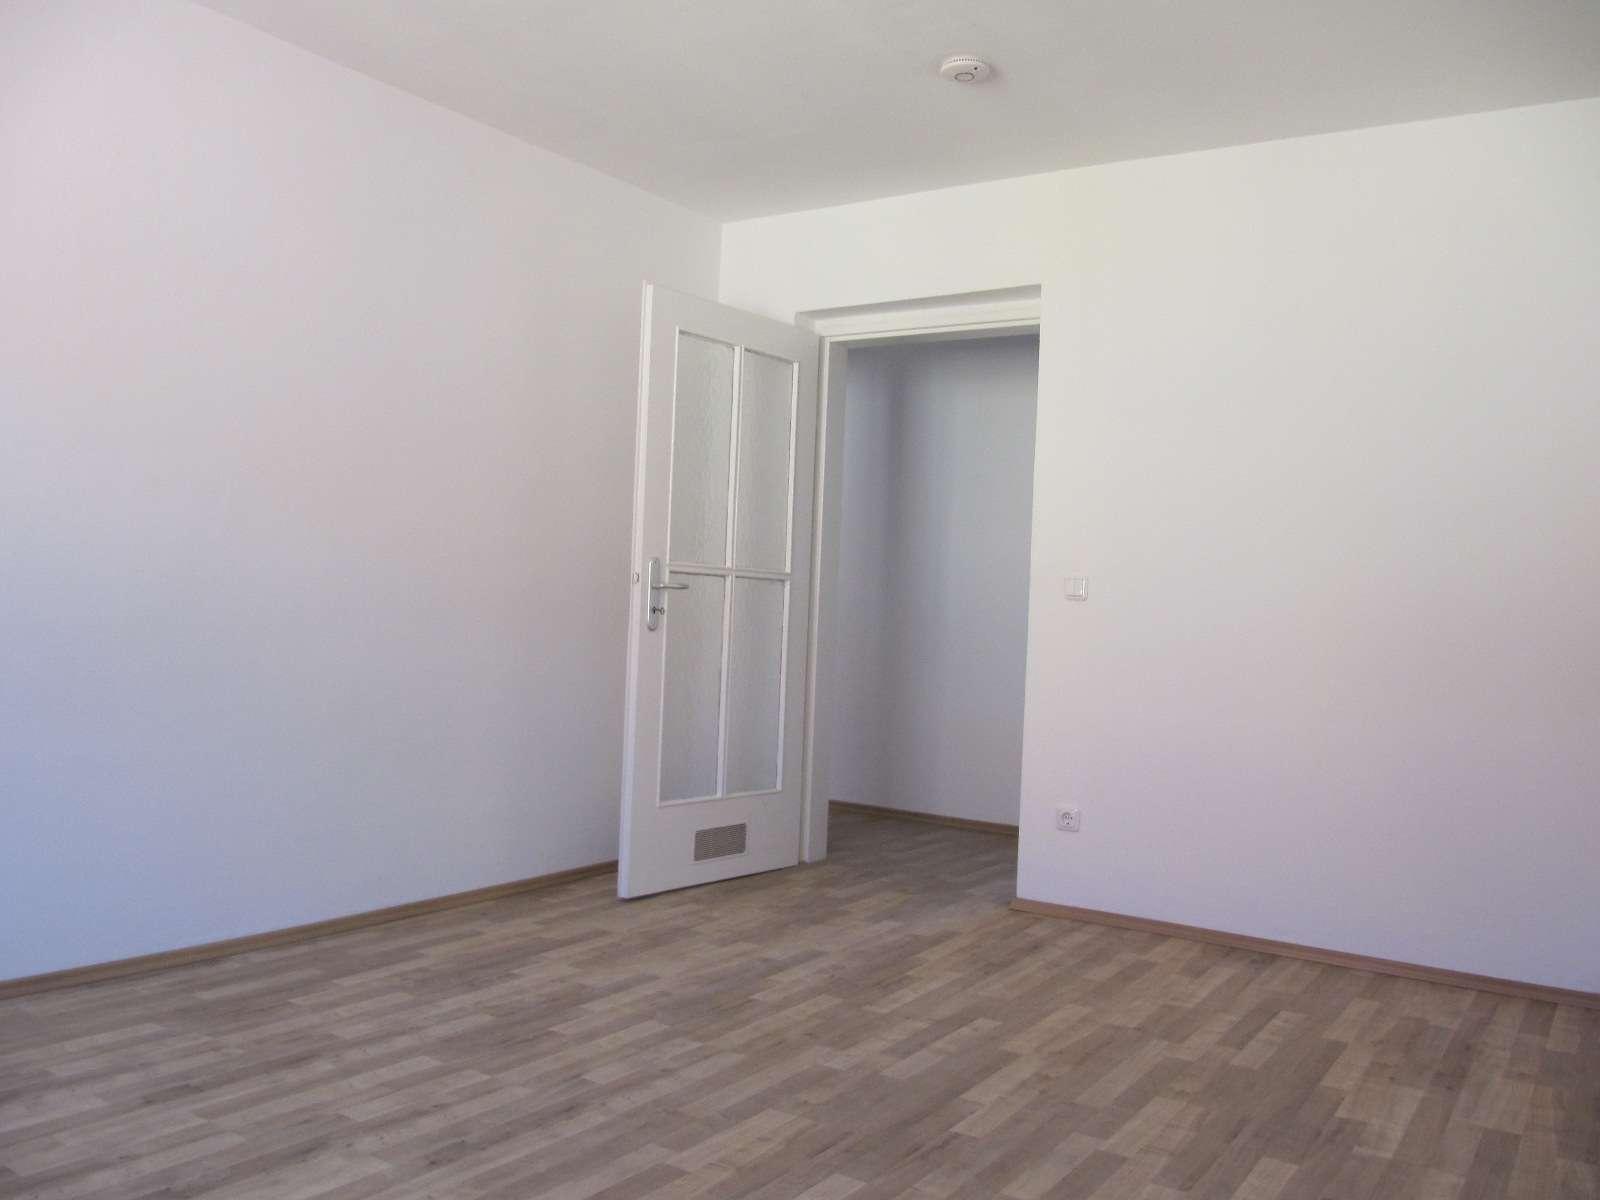 Nähe Gugelstraße! Renovierte 2-Zi.-Altbau-Whg. ca. 53, 4.OG ohne Aufzug